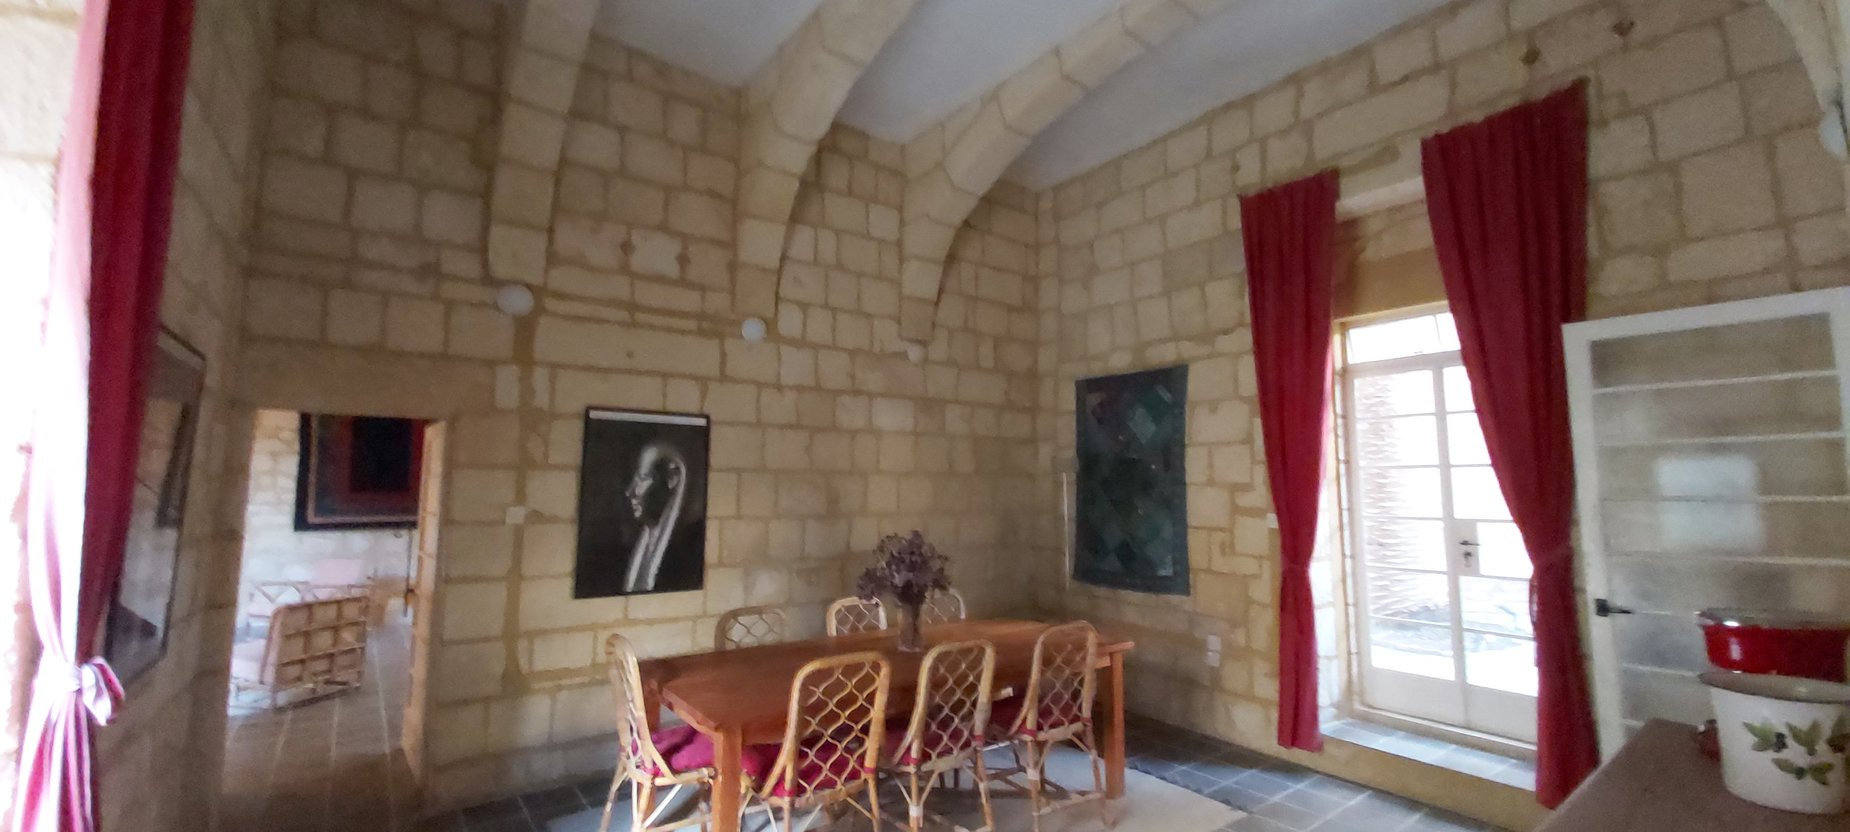 5 bed Town House For Sale in Lija, Lija - thumb 12